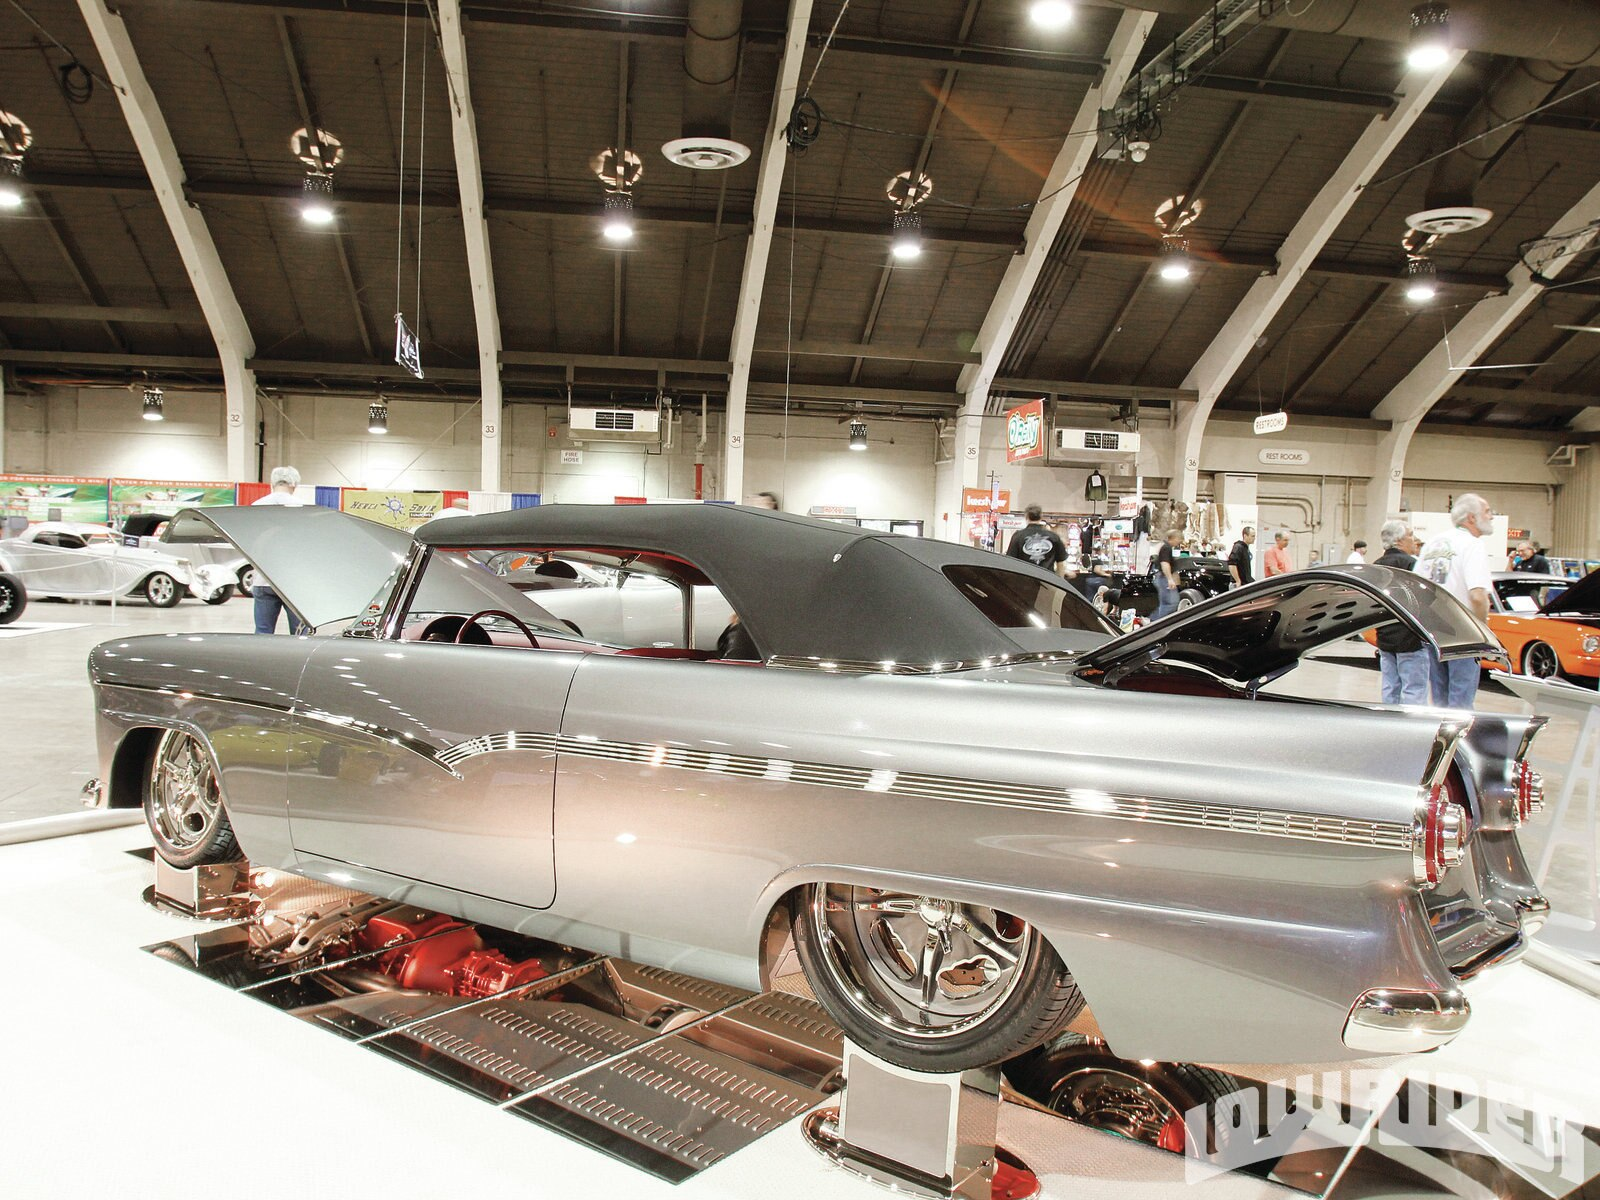 1207-lrmp-01-o-2012-pomona-roadster-show-custom-lowrider1